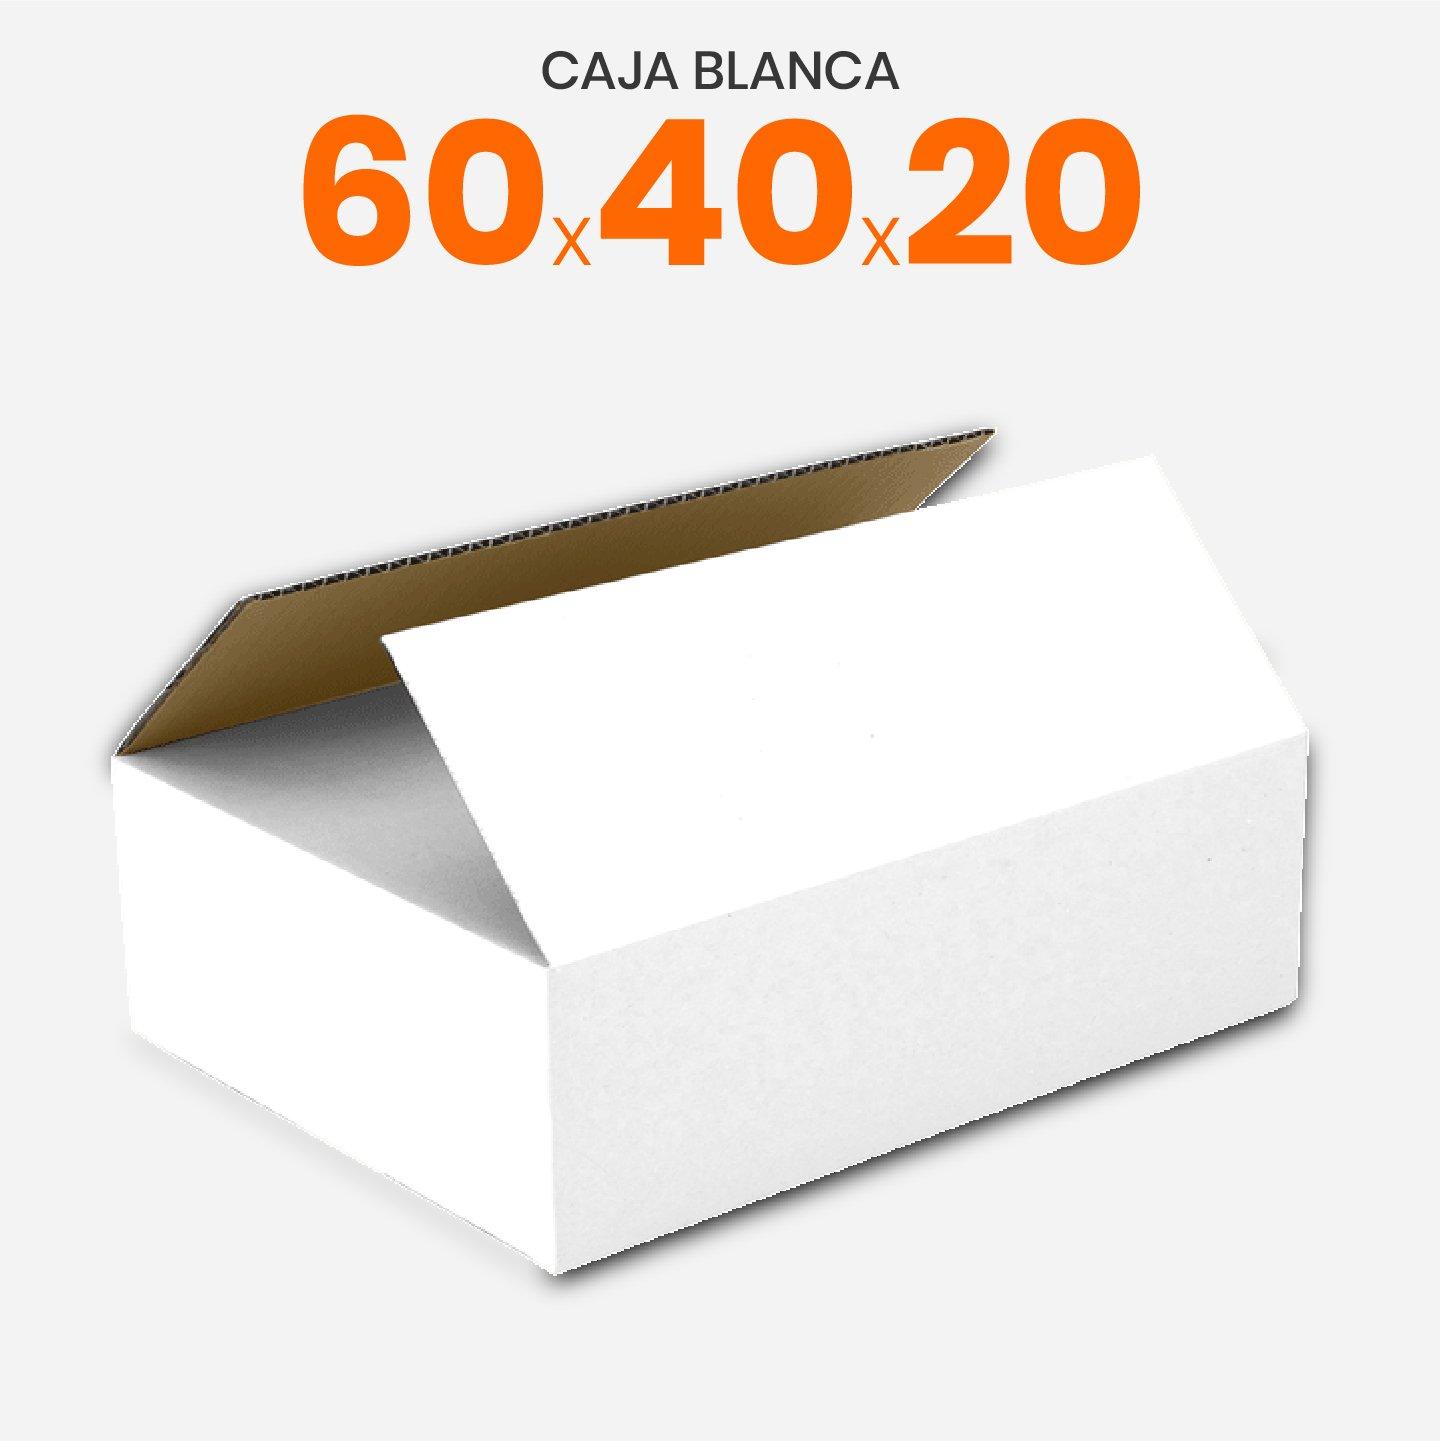 Caja De Cartón Corrugado Blanca 60X40X20